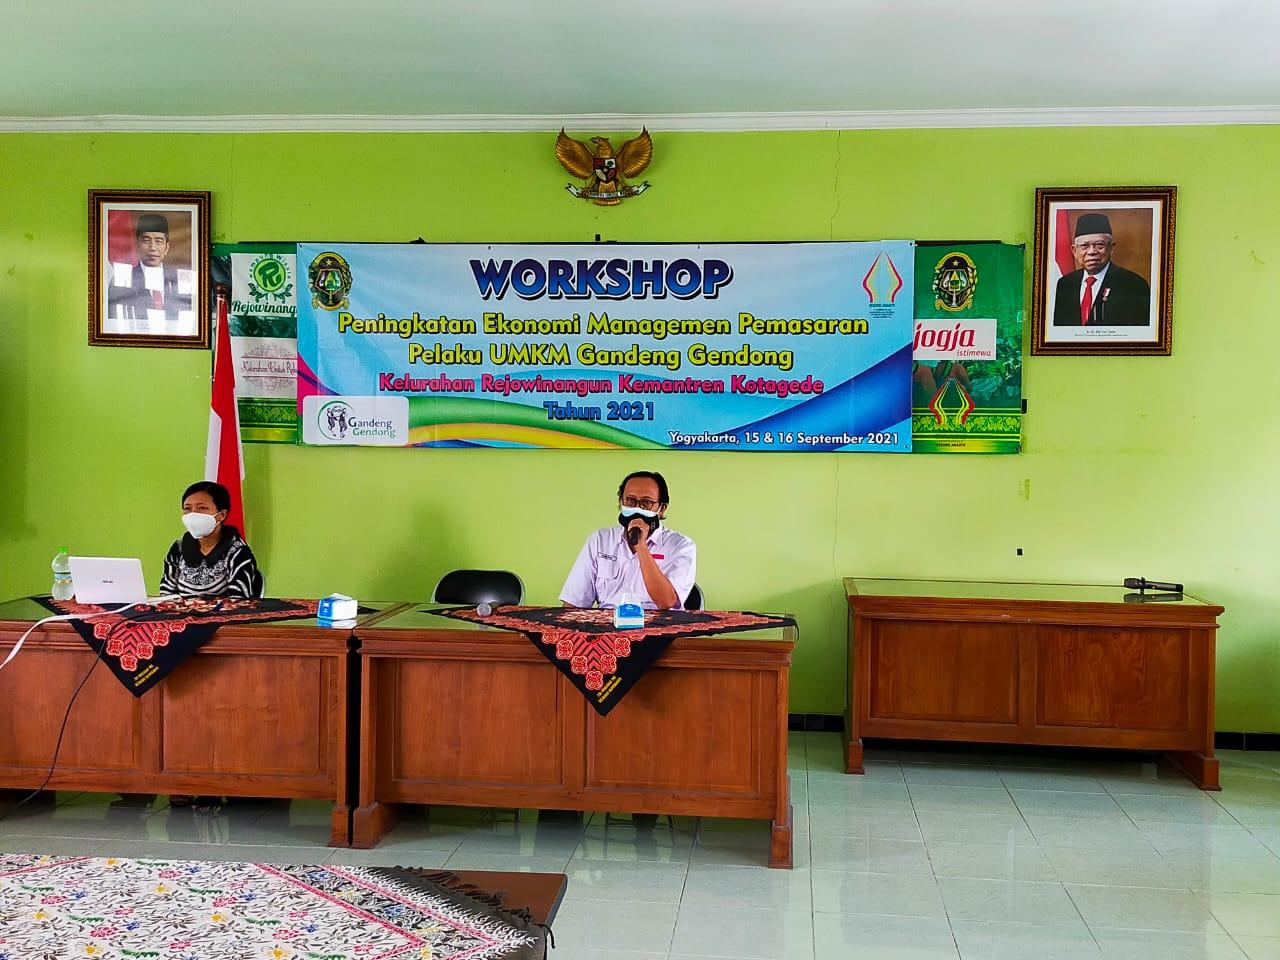 Workshop Peningkatan Ekonomi Manajemen Pemasaran  Pelaku UMKM Gandeng Gendong